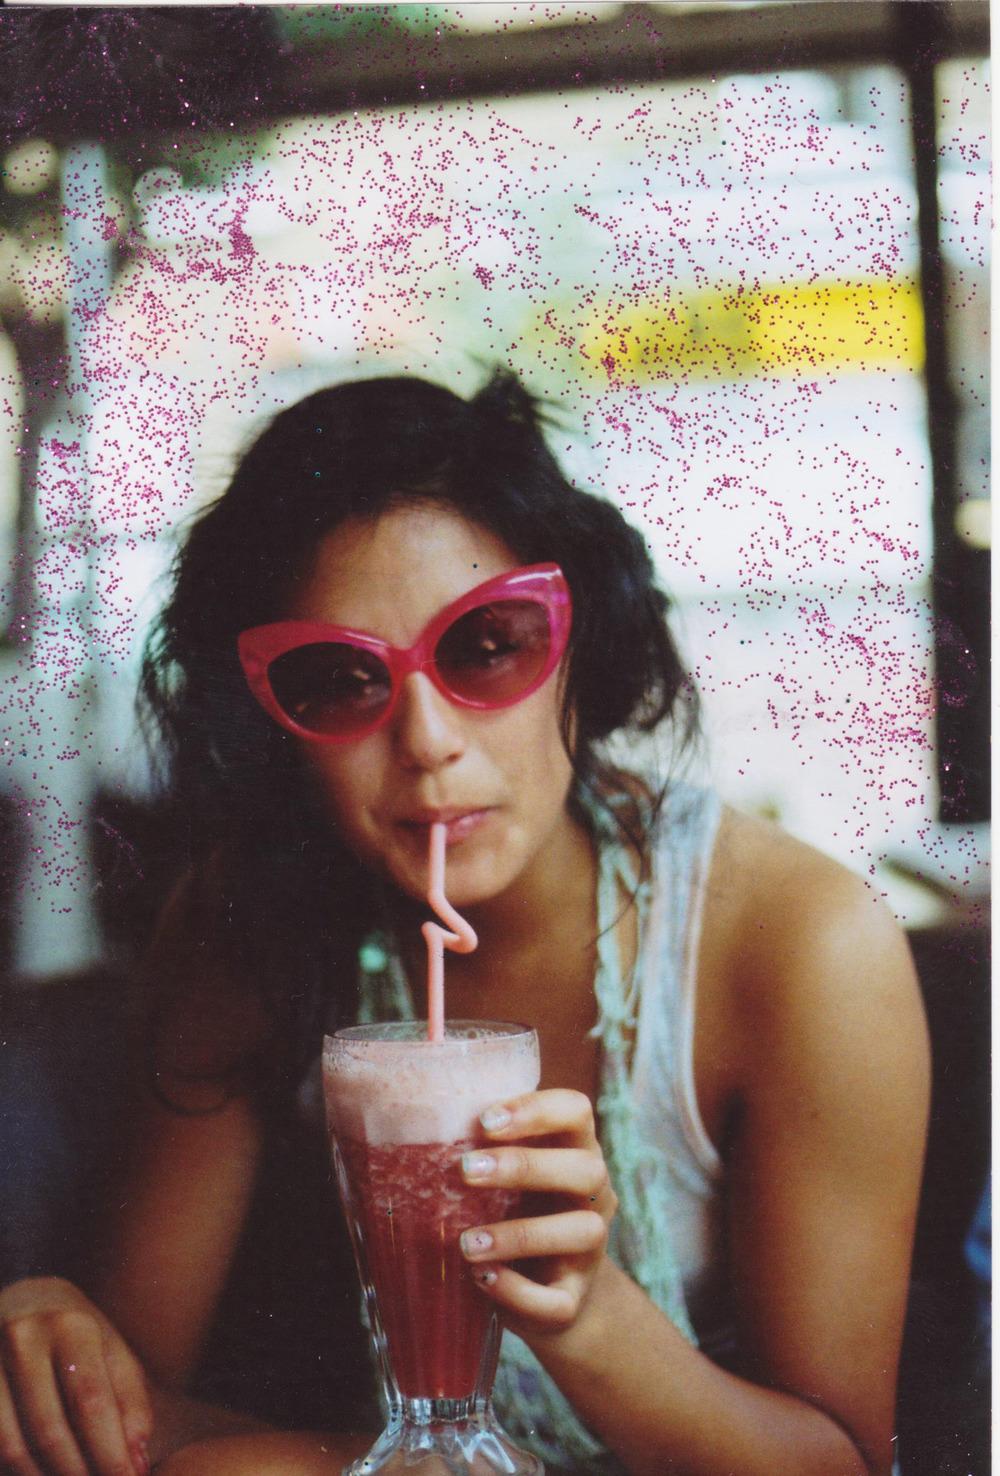 Love this Photo of Milkshakes and Shades